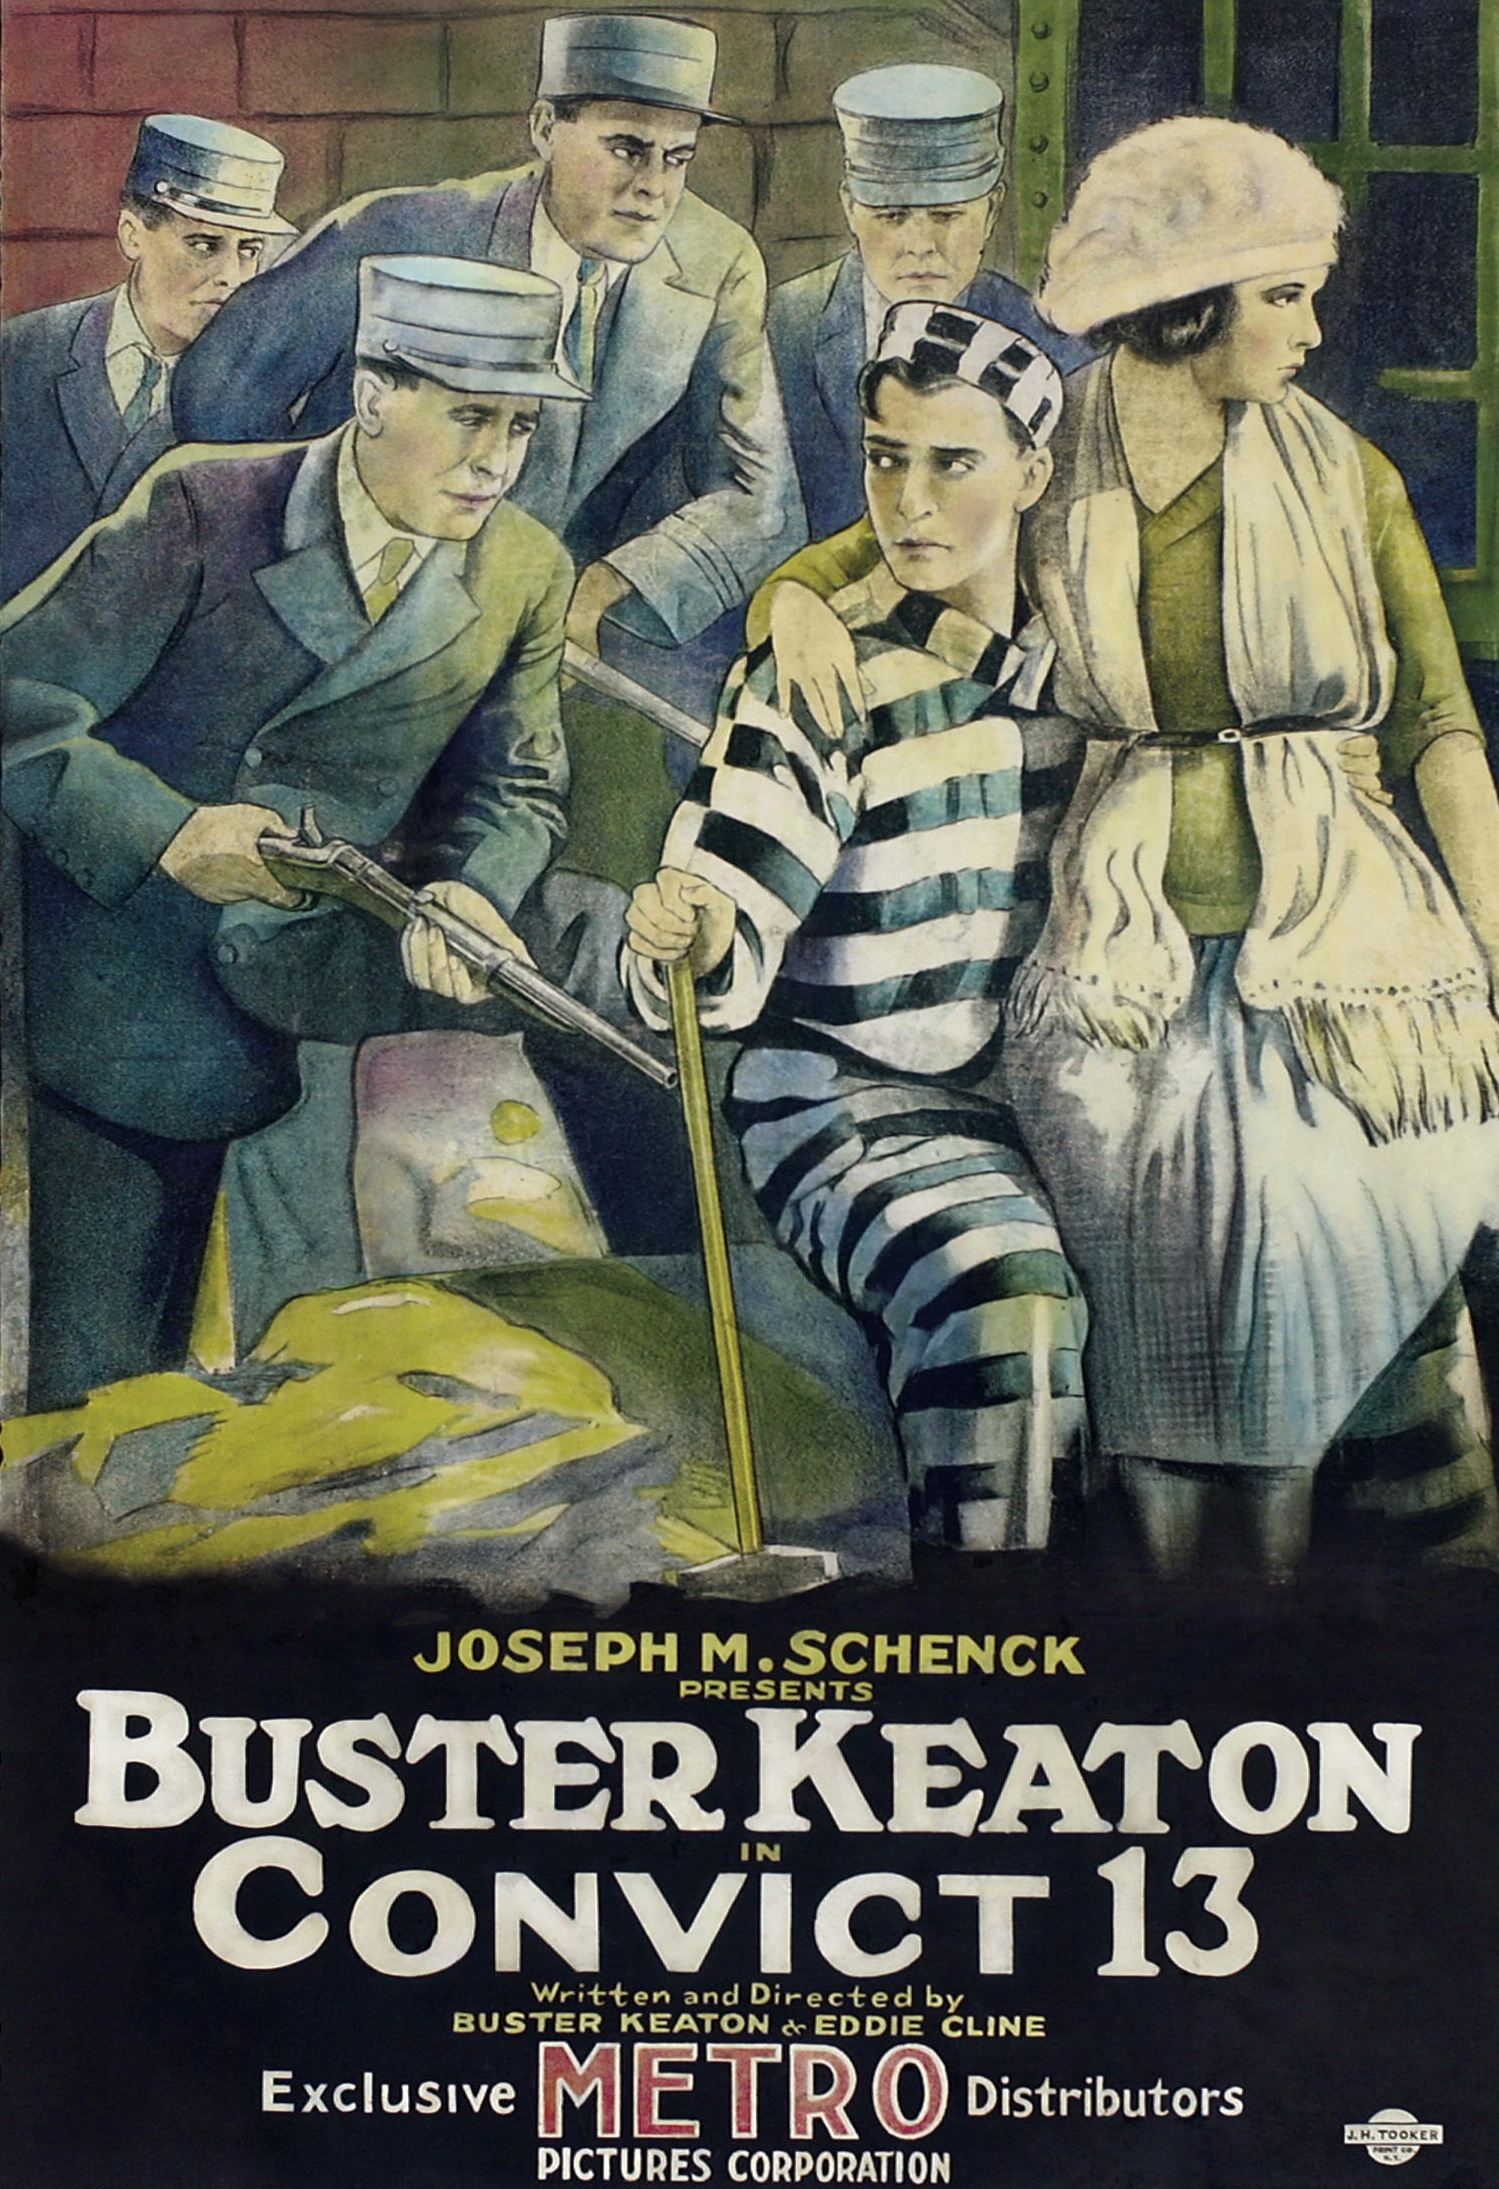 Buster Keaton - Convict 13 [1920] (MEGA)